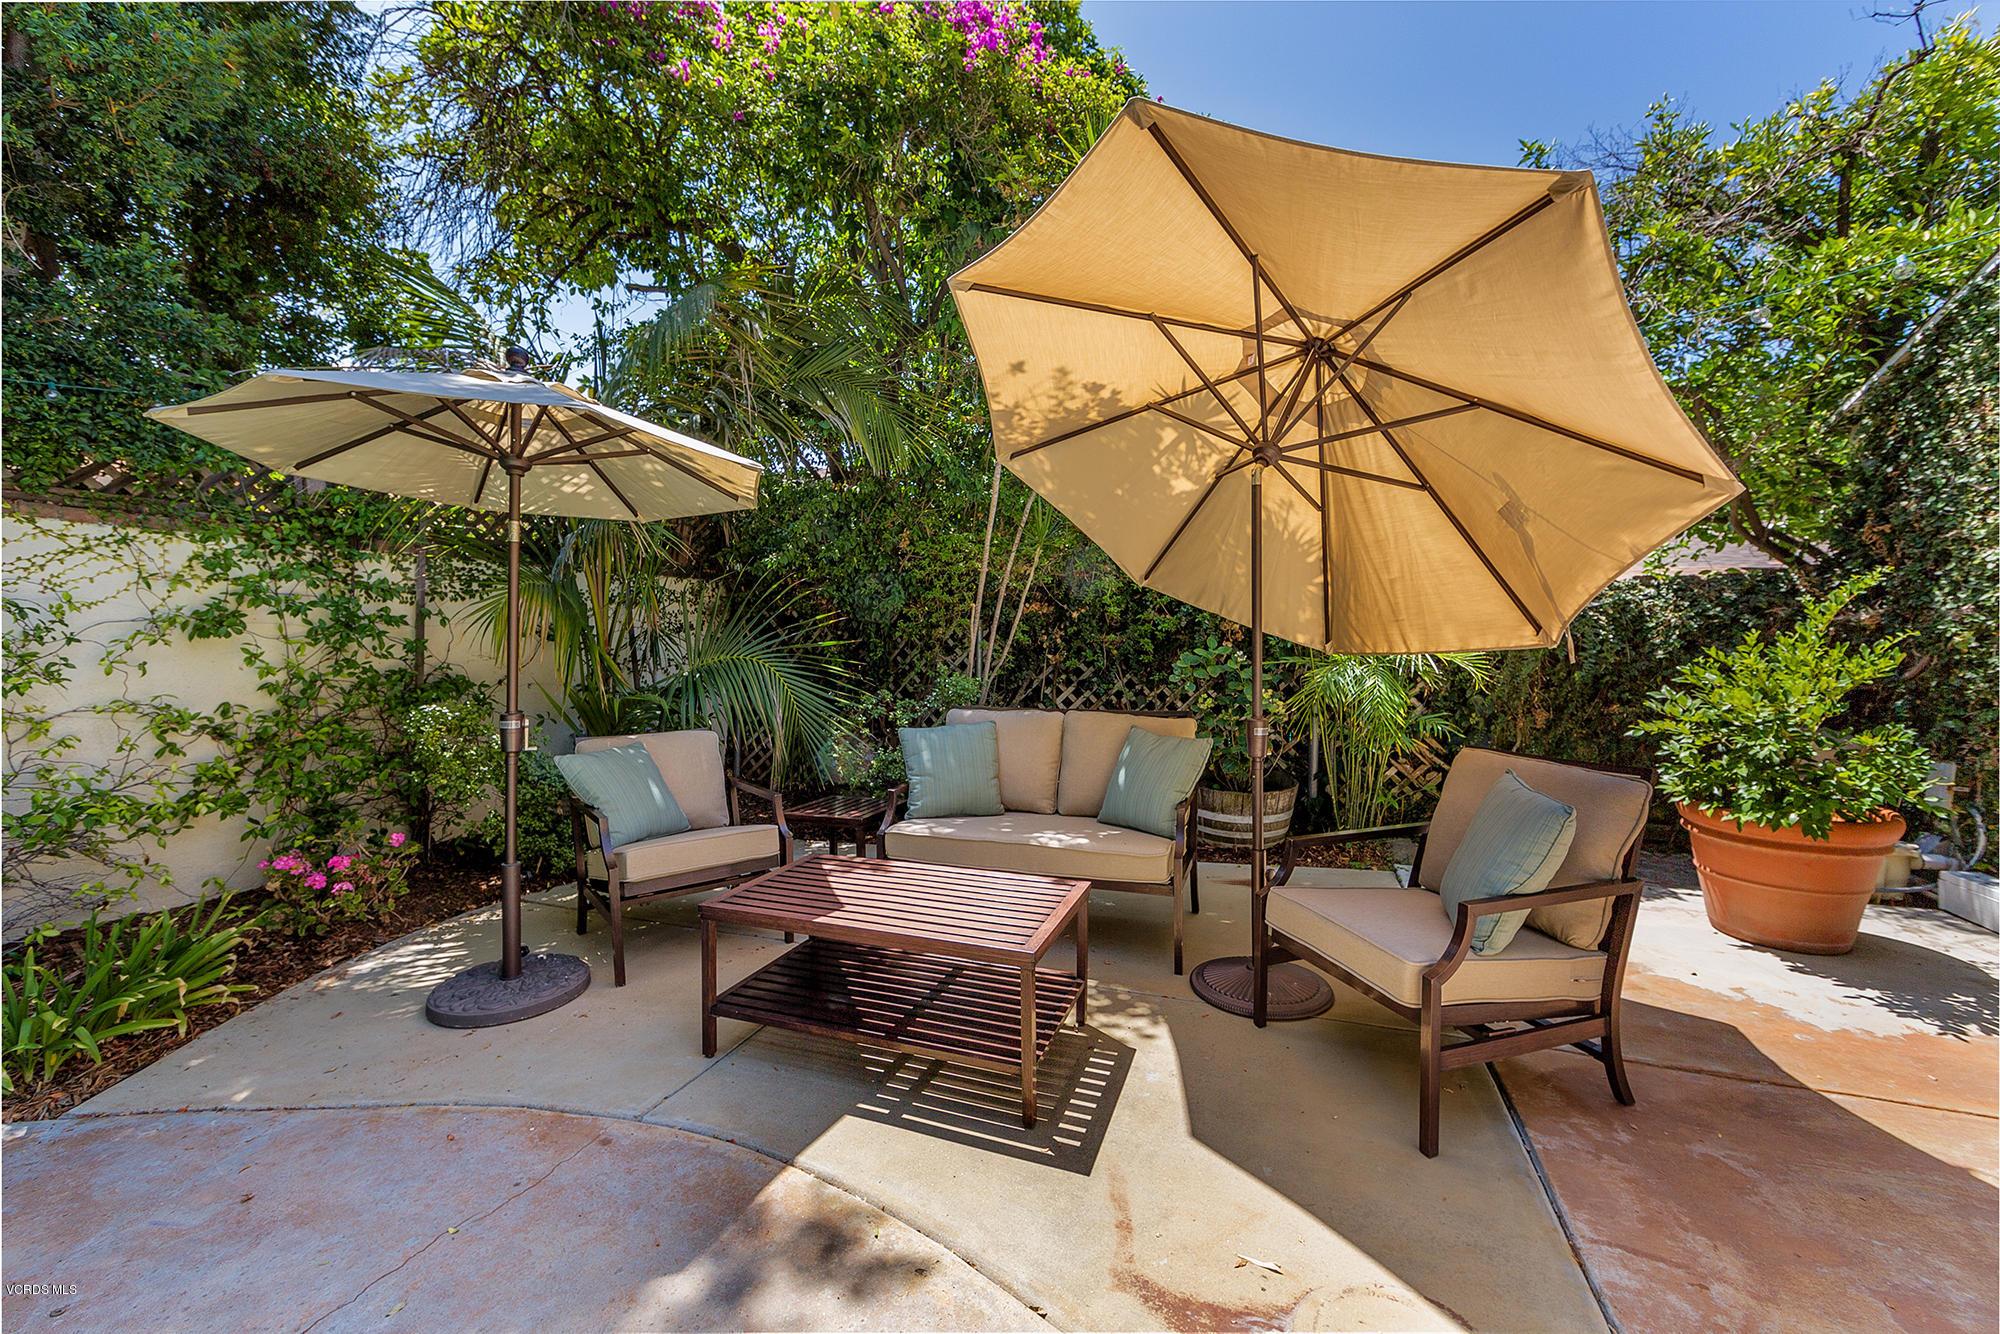 5444 Ventura Canyon Avenue, Sherman Oaks, CA 91403 | Dilbeck Real Estate